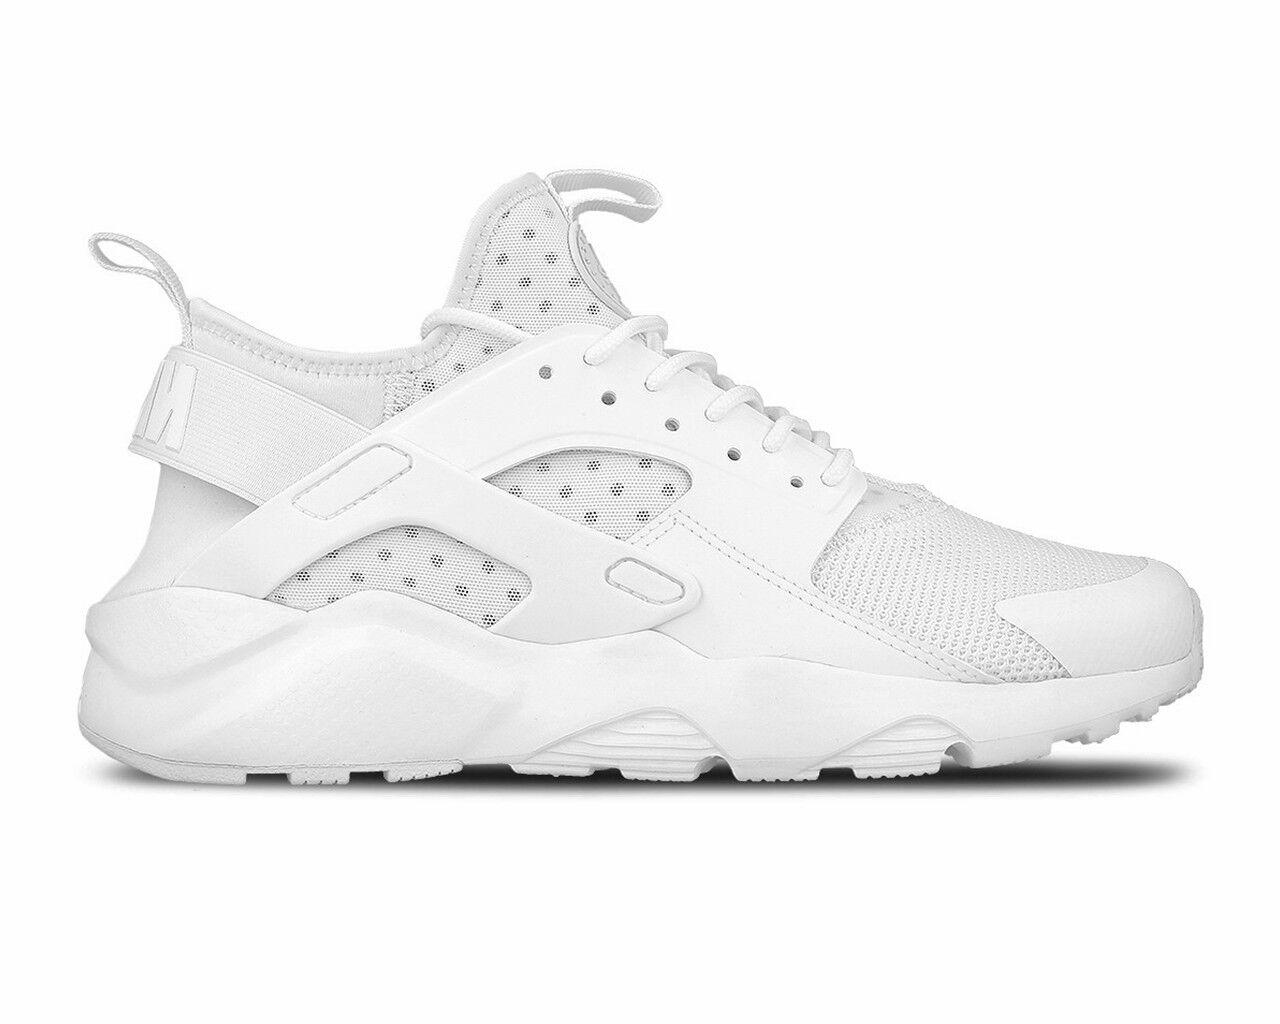 brand new 50c6b d0c8b ... store vente nike air huarache ultra 819685 101 de baskets homme blanc  gym chaussures de 101